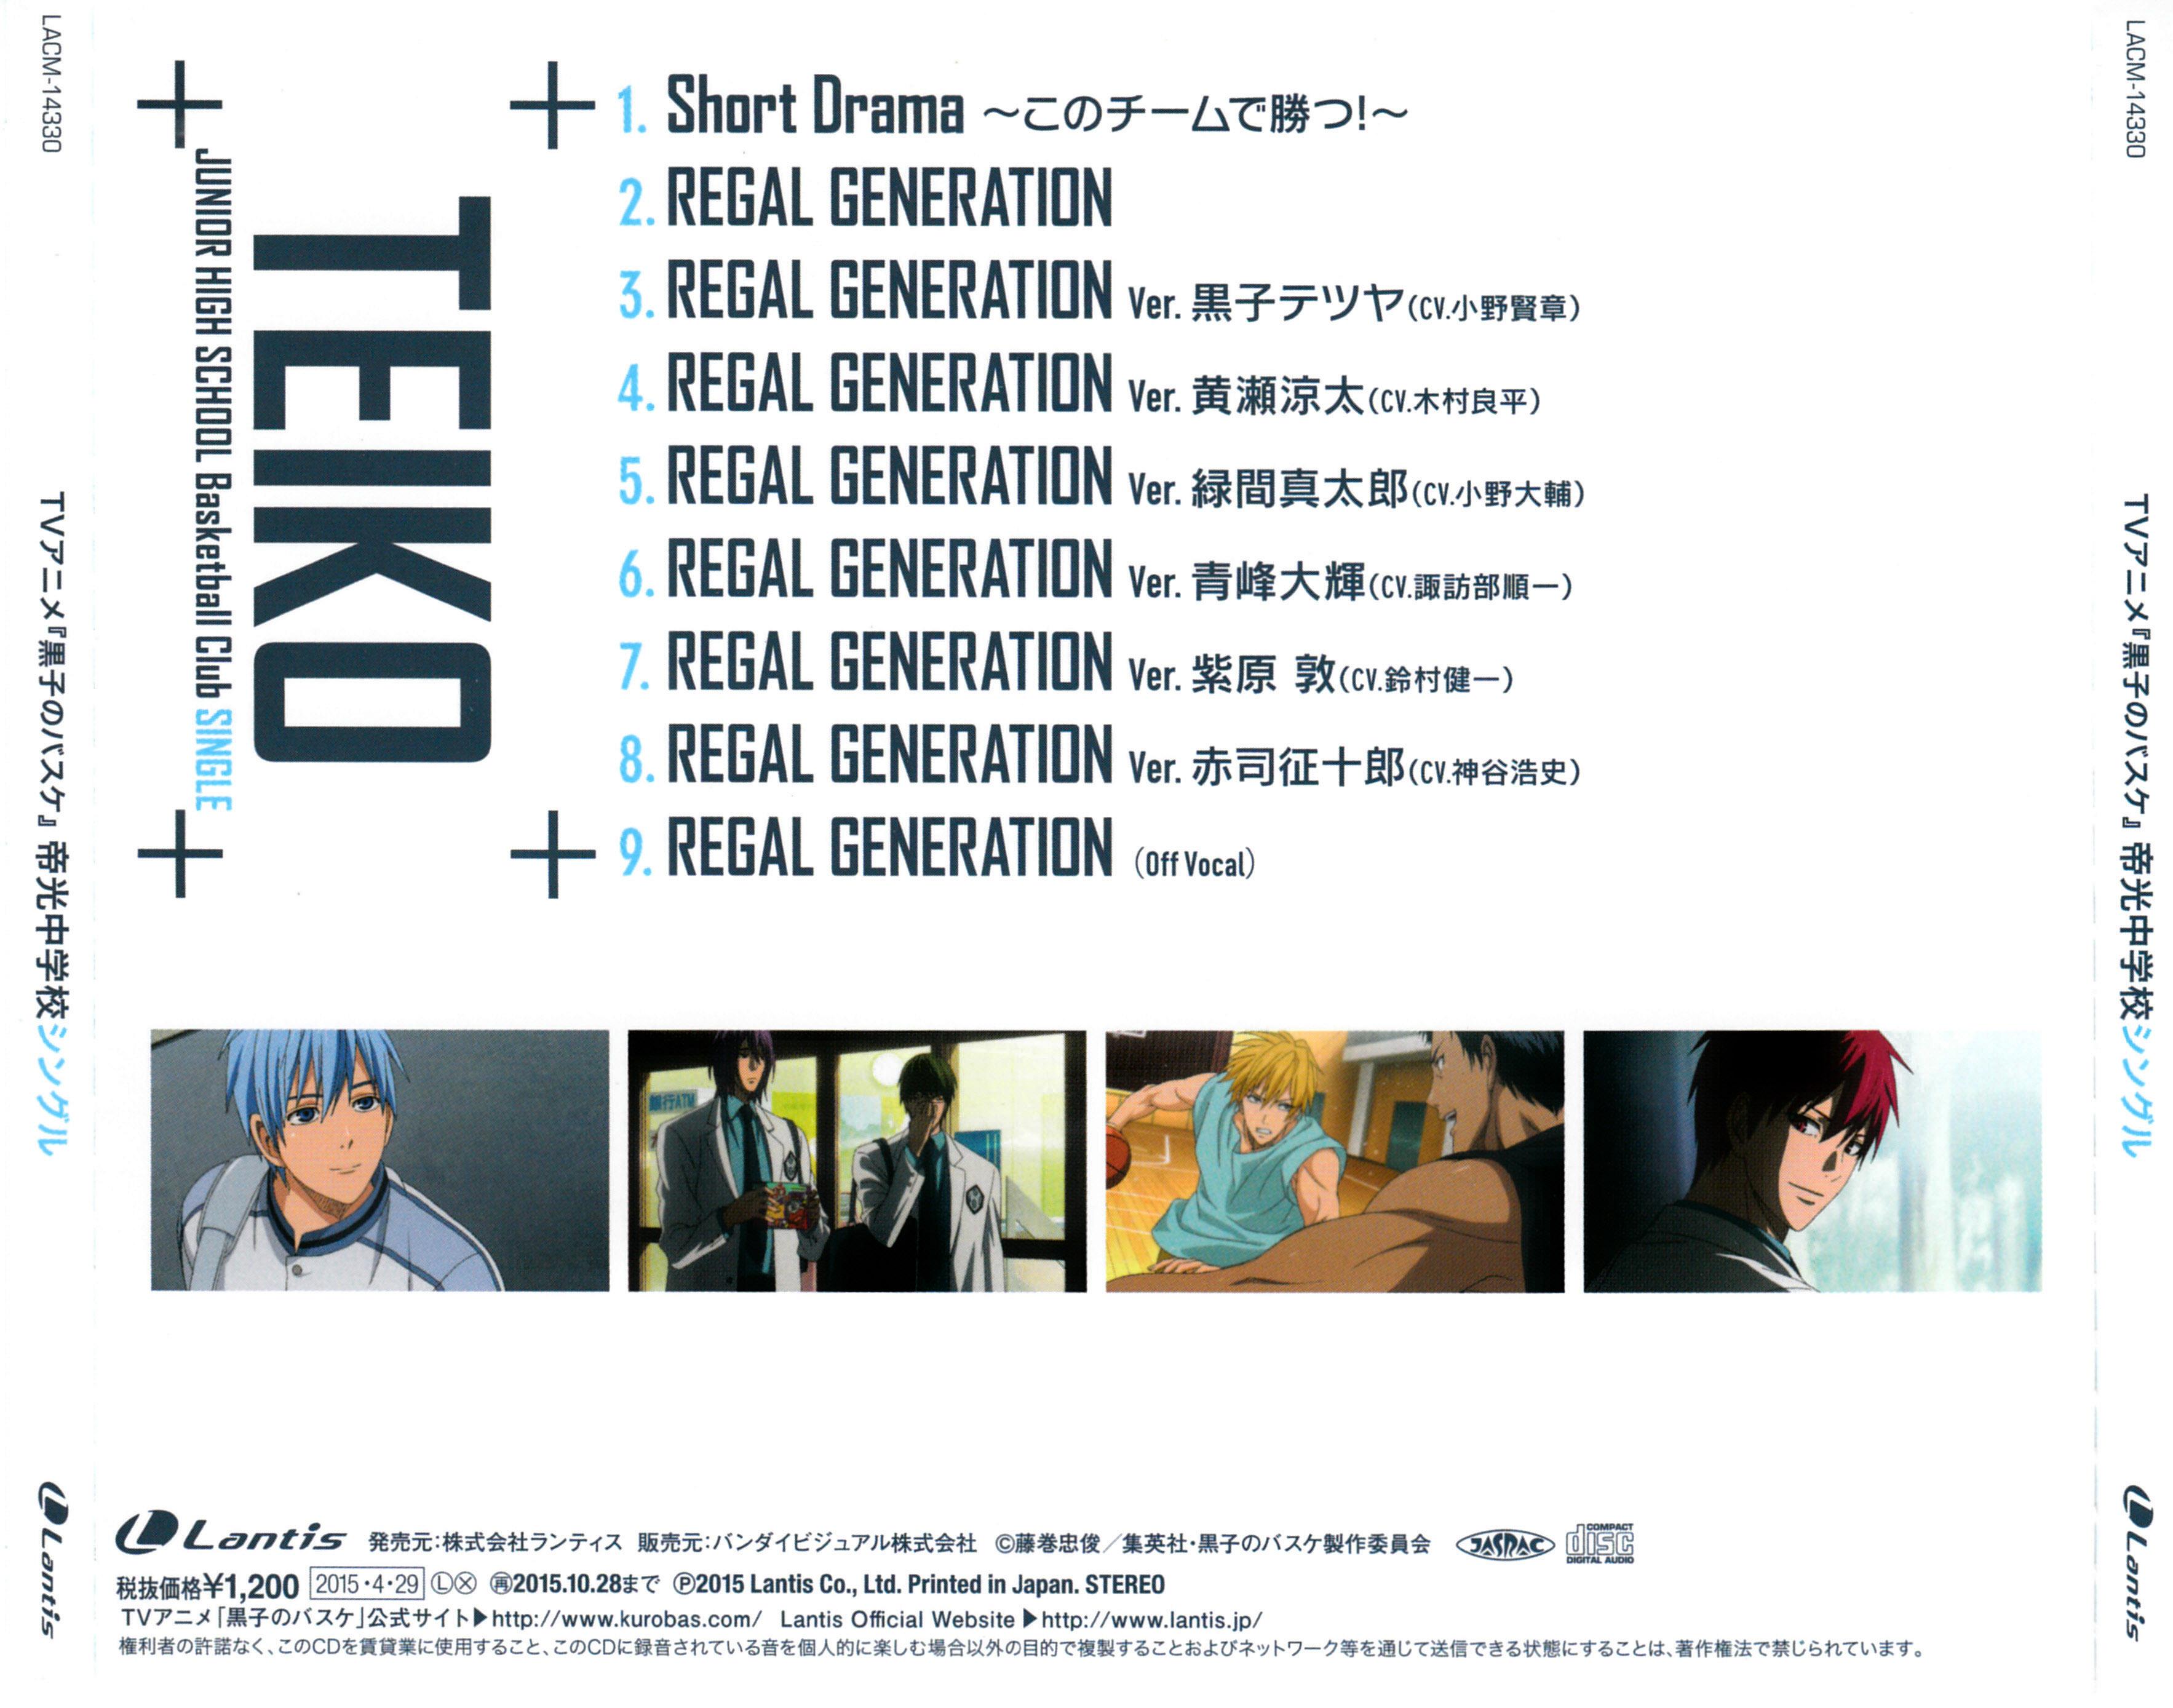 Kise Kuroko Character Song Lyrics